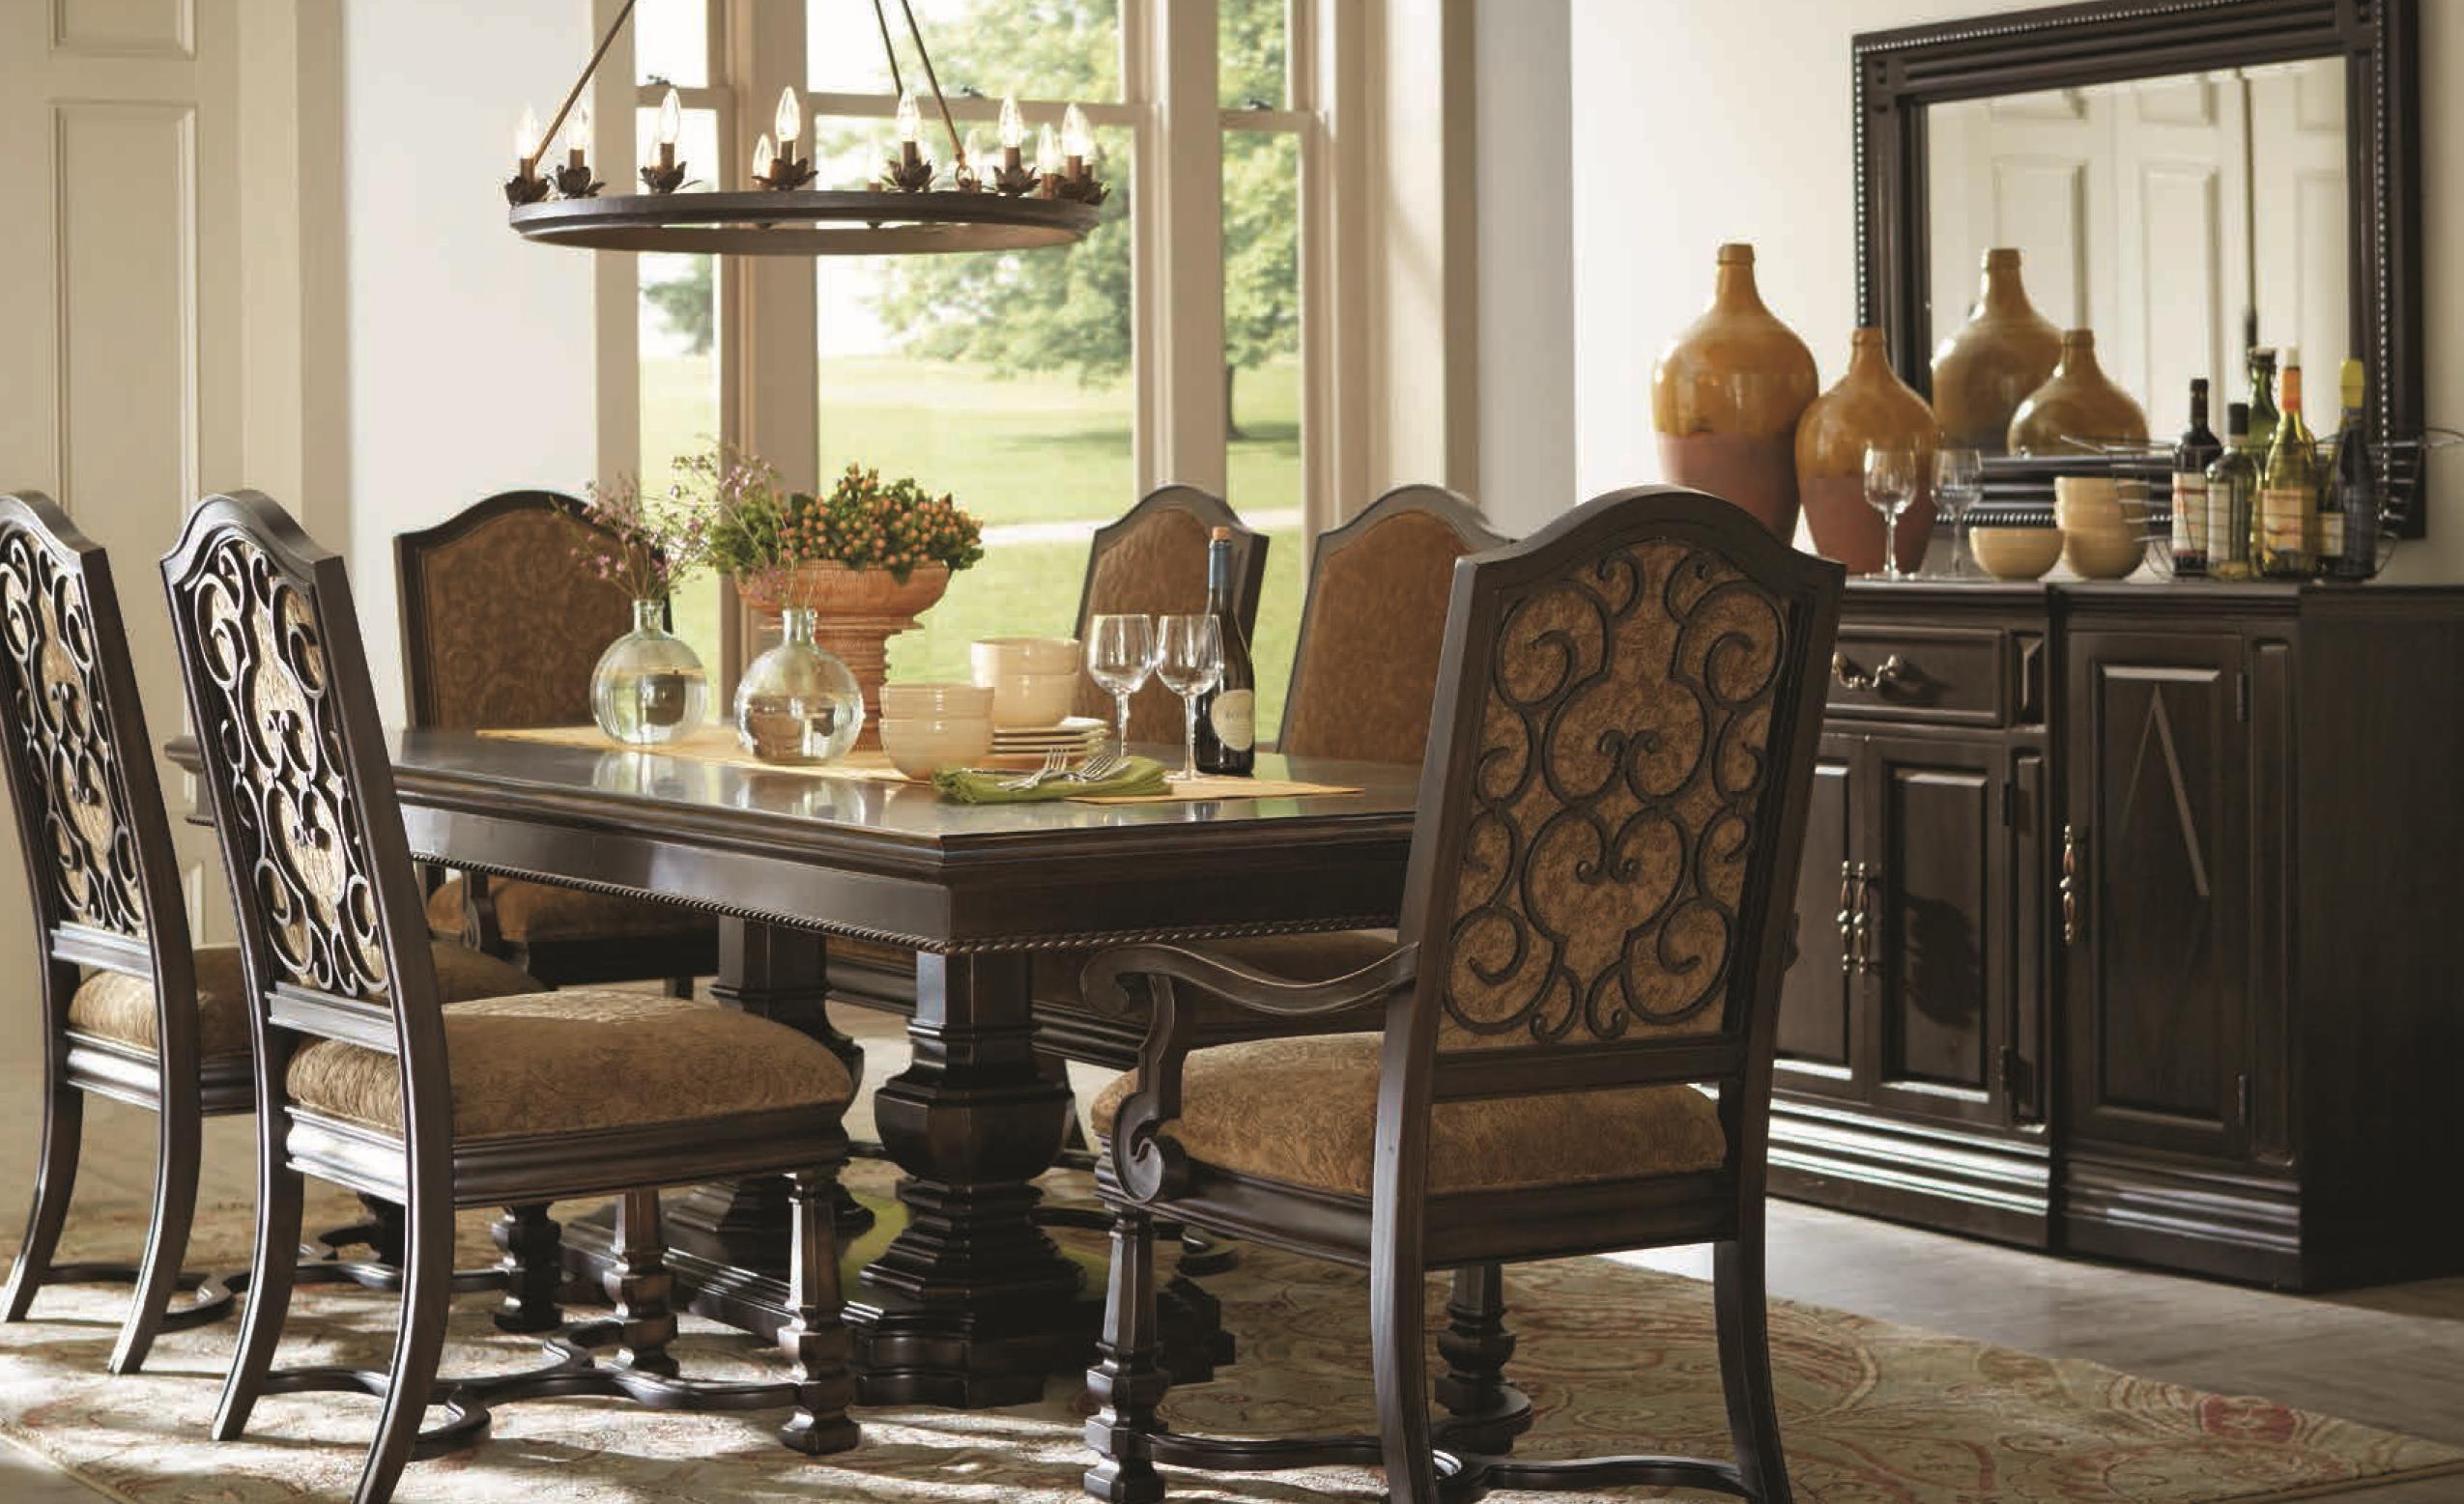 Marbella noir formal dining room group by art furniture